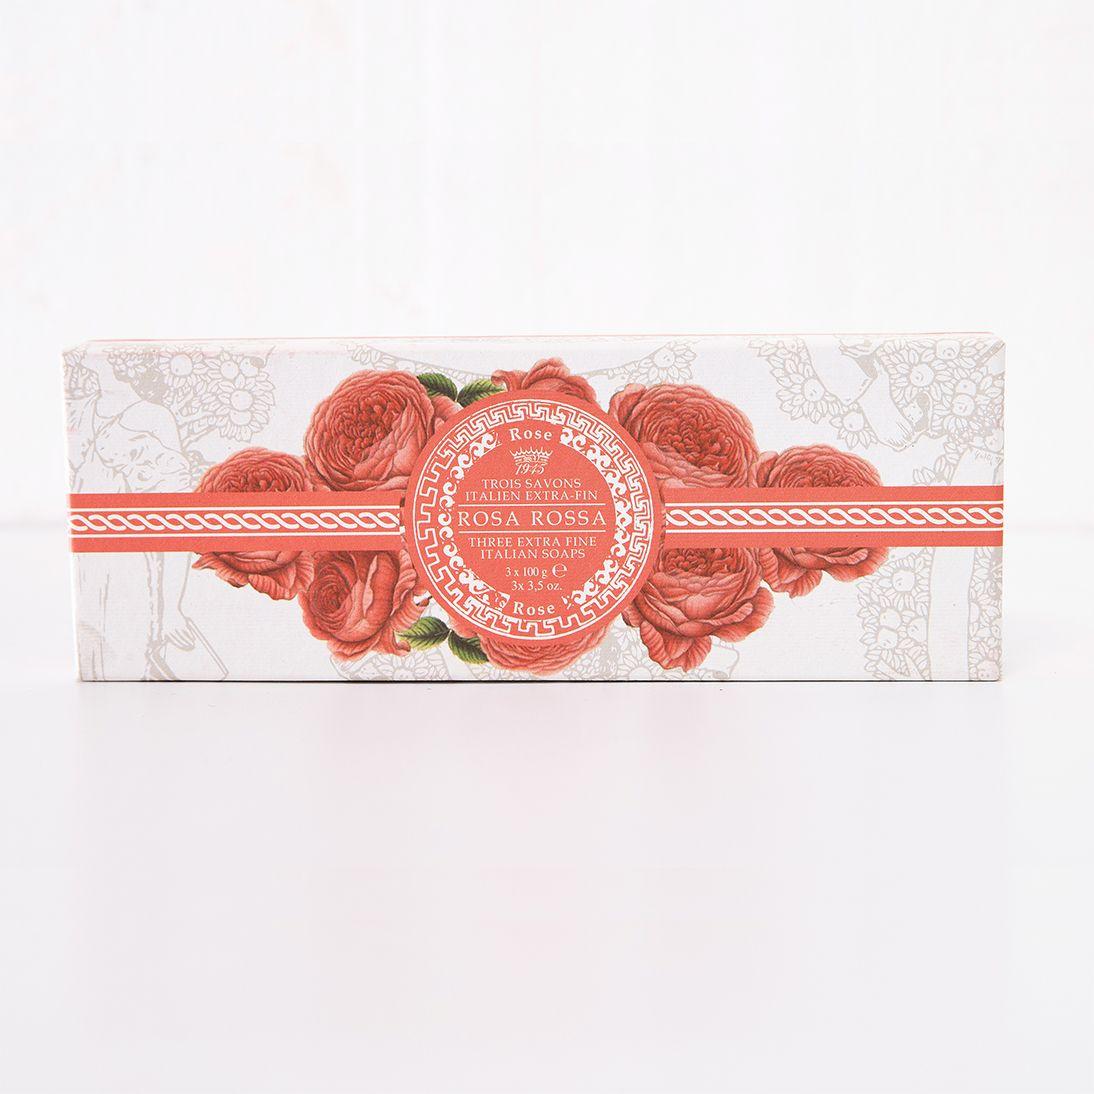 SV1945 罗马血玫瑰精油美肤皂